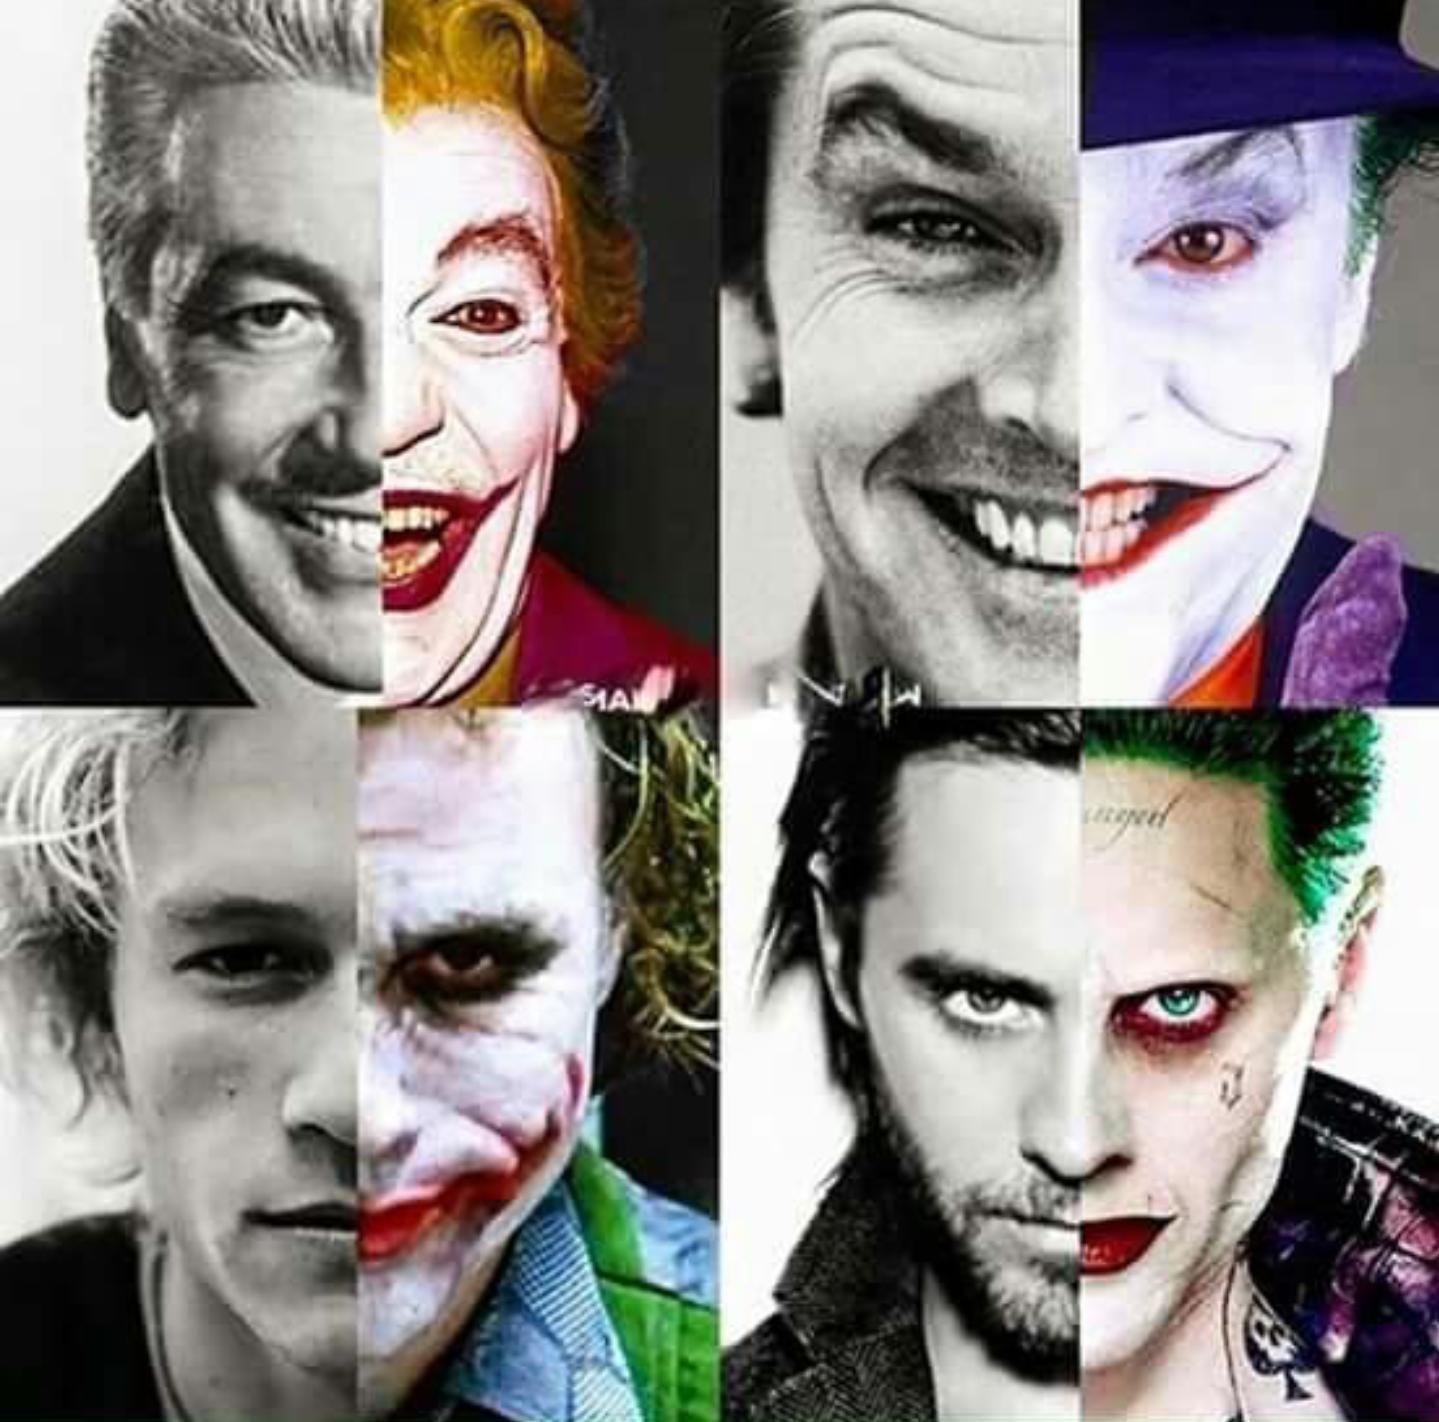 Cesar Romero Jack Nicholson Heath Ledger and Jared Leto each split face as The Joker and themselves.